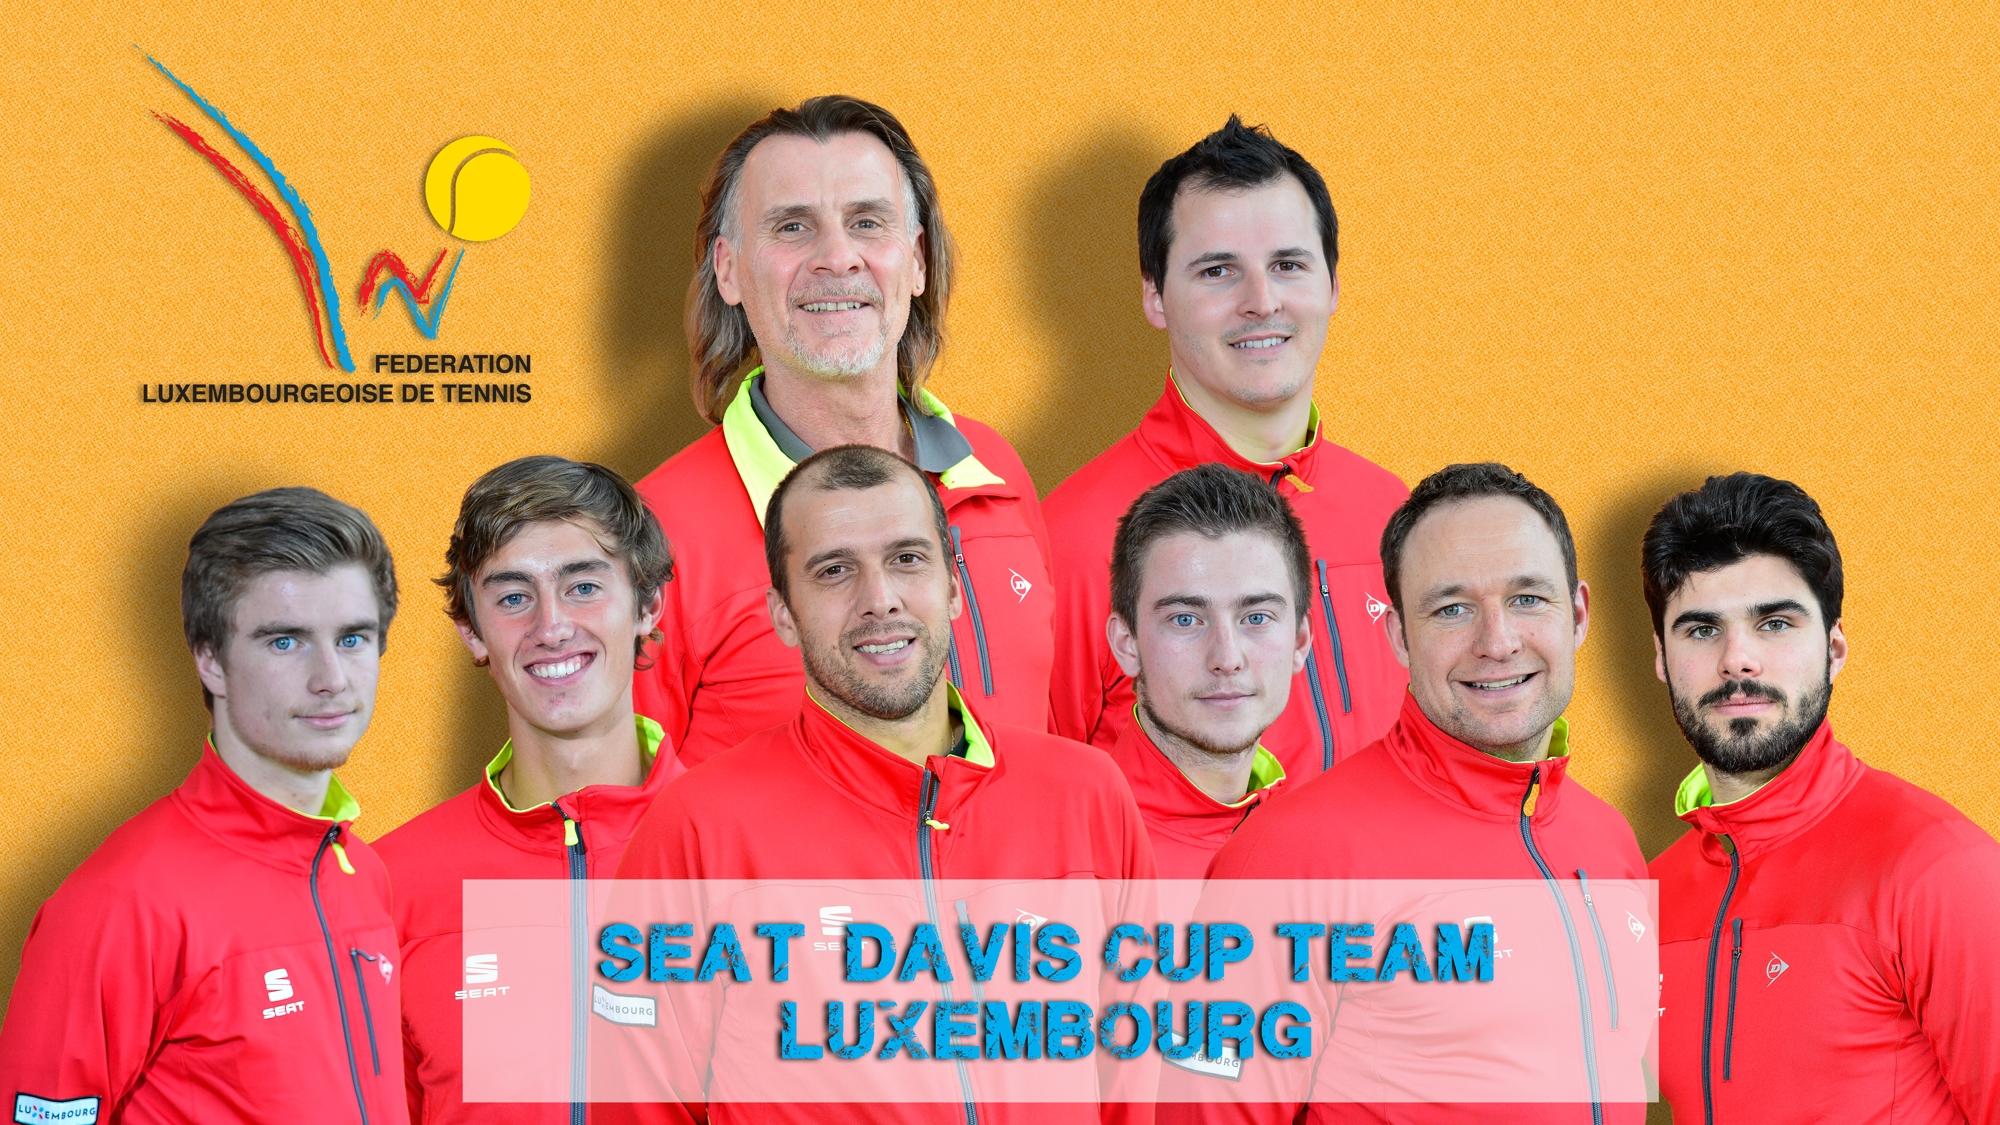 SEAT   DAVIS CUP 2018